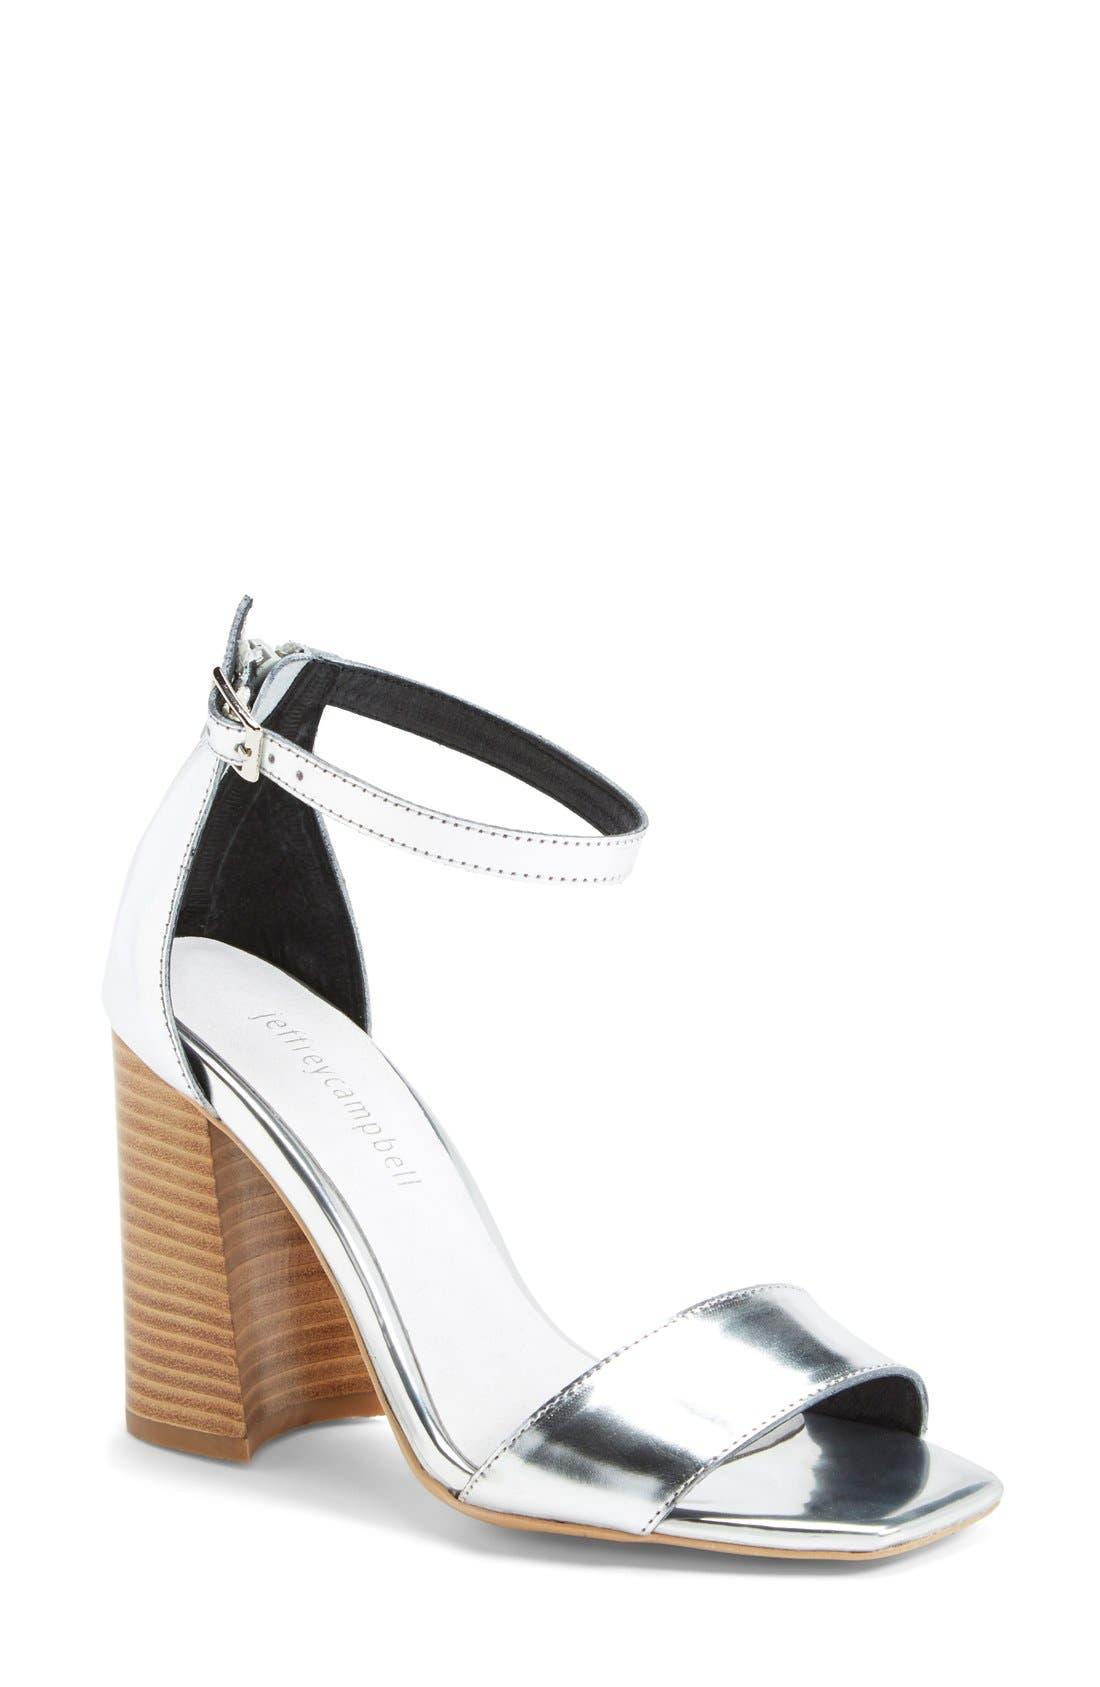 Main Image - Jeffrey Campbell 'Manor' Metallic Leather Ankle Strap Sandal (Women)